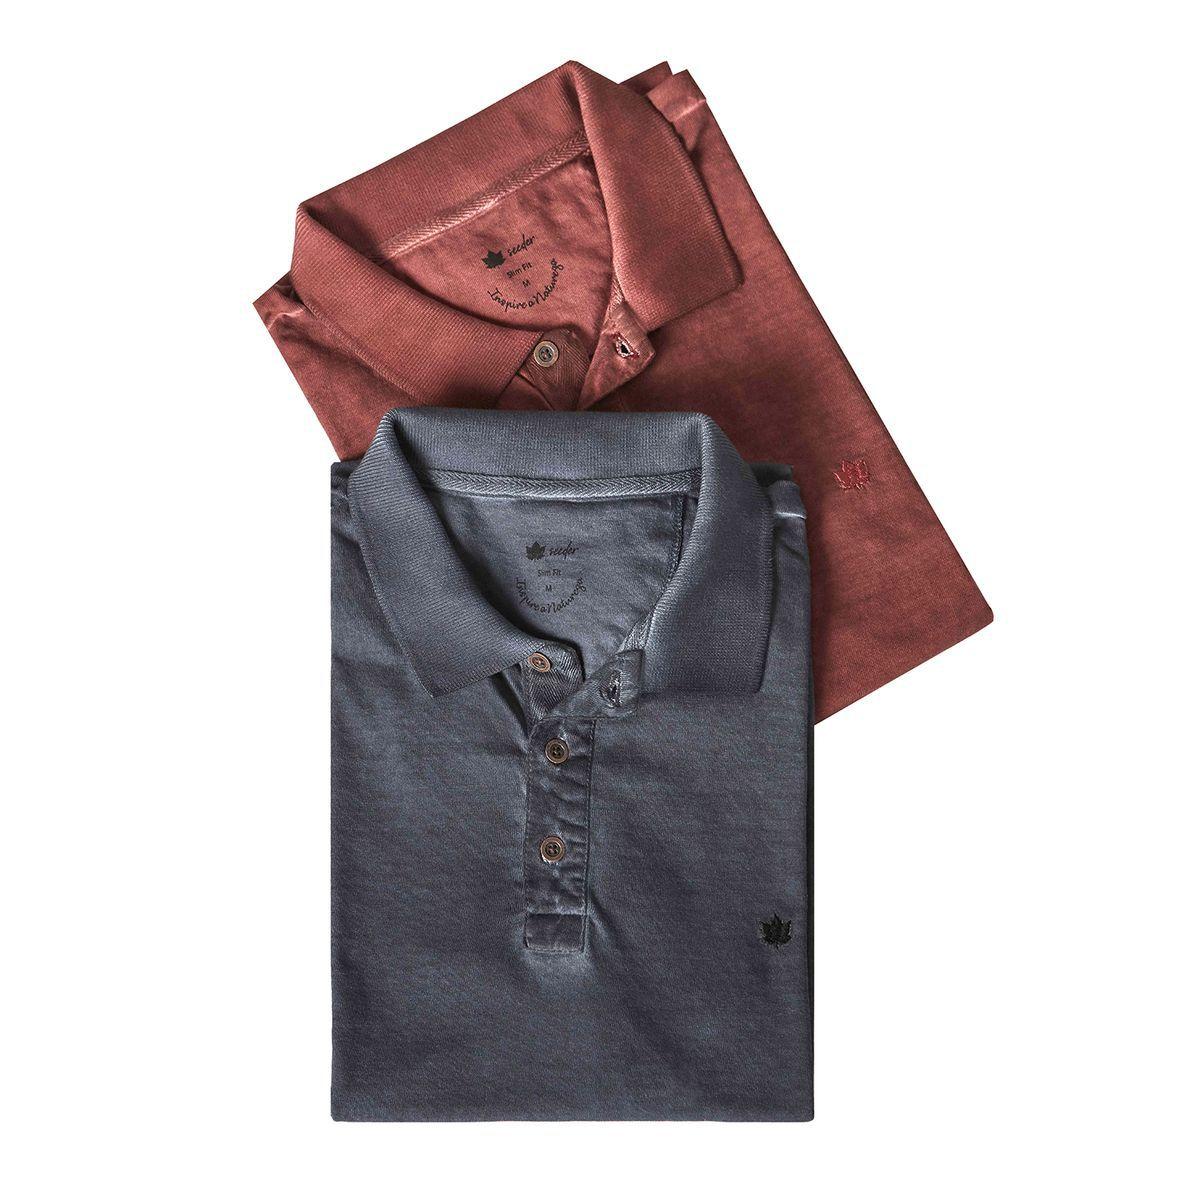 Camisa Polo Seeder Meia Malha Vinho